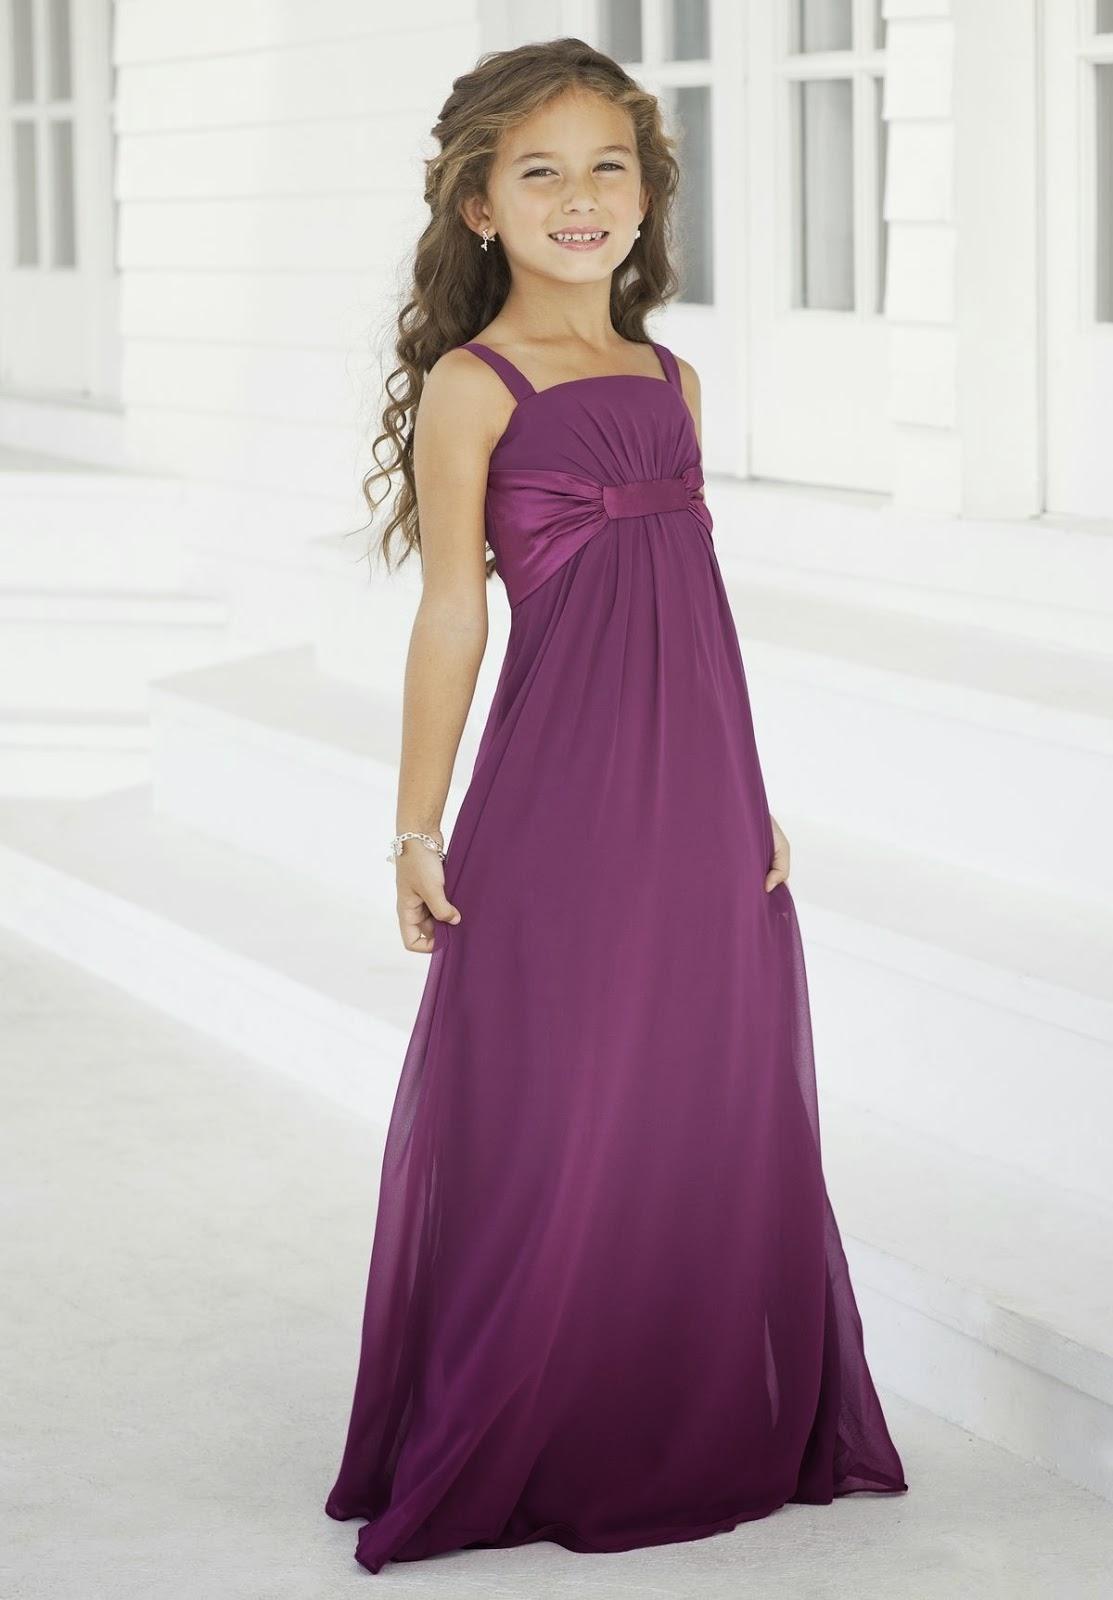 whiteazalea junior dresses trendy purple color dresses for junior bridesmaids. Black Bedroom Furniture Sets. Home Design Ideas